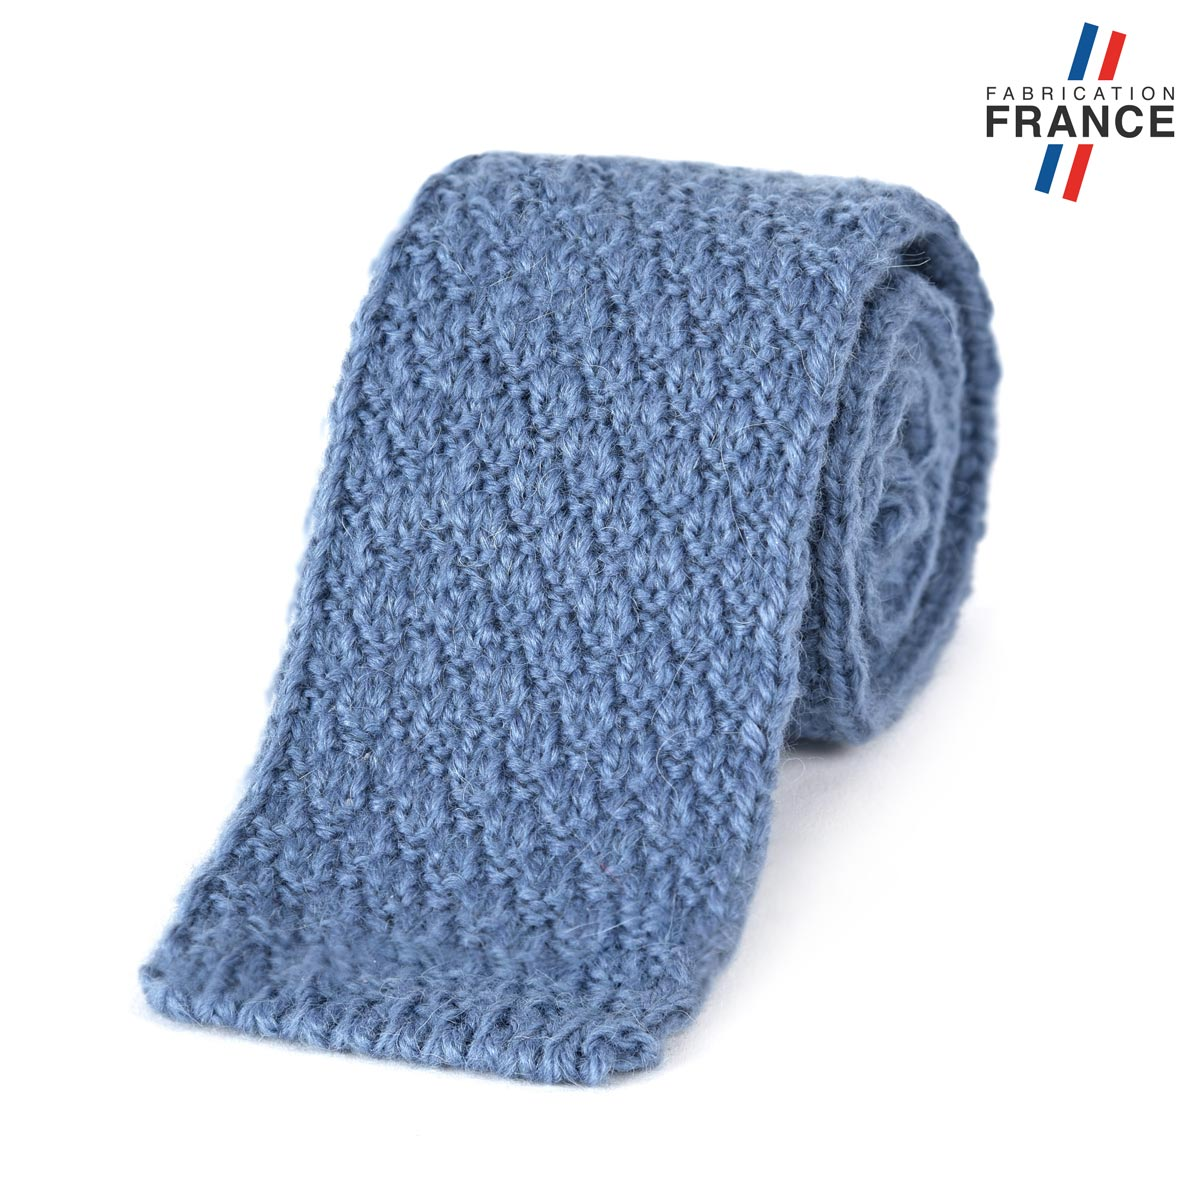 CV-00461_F12-1FR_Cravate-tricot-bleu-clair-fabrication-francaise